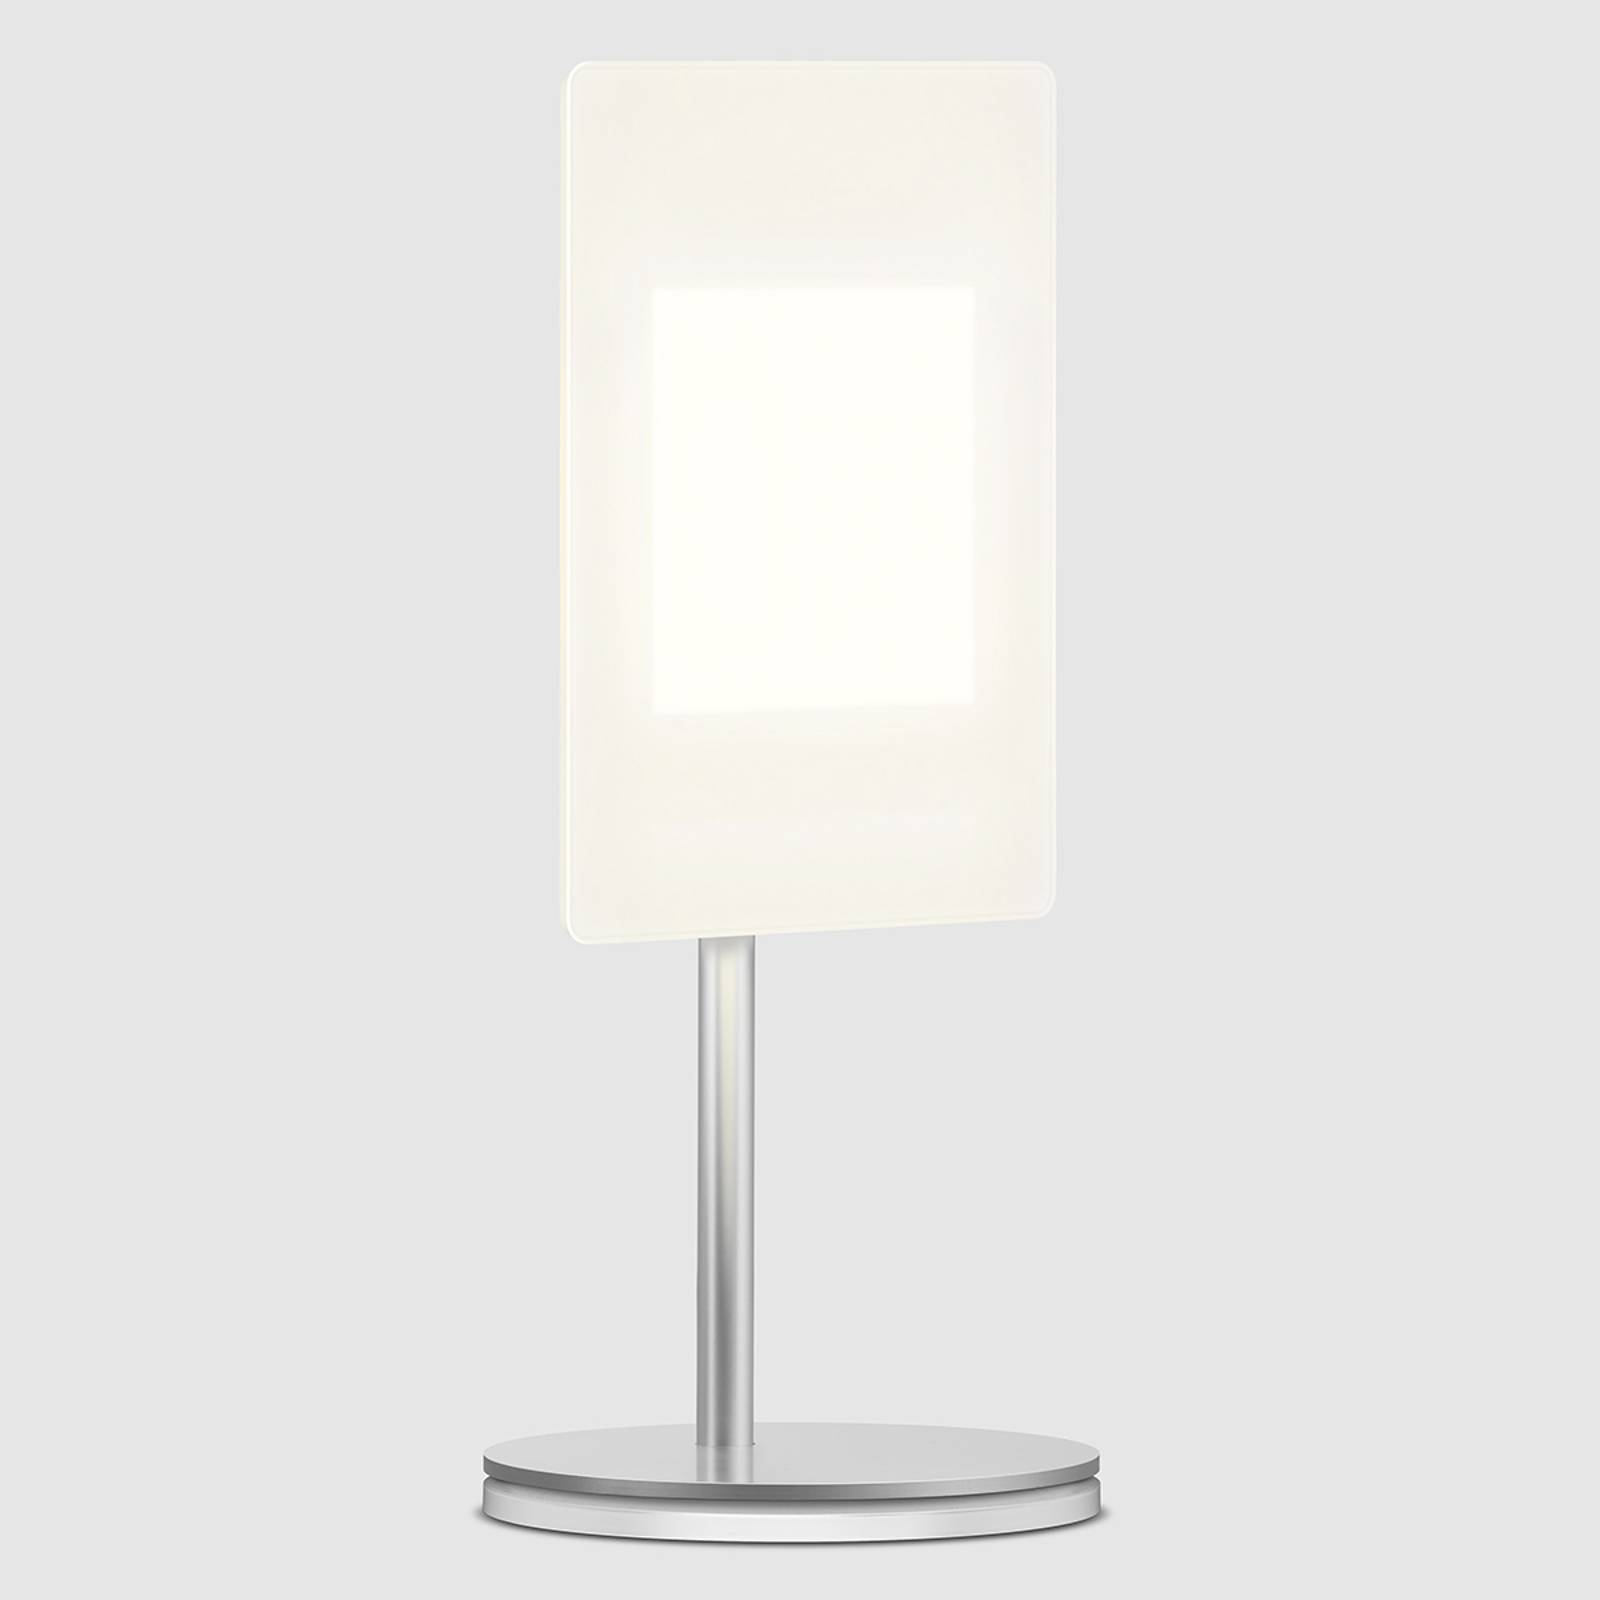 OLED-pöytävalo OMLED One t1 – OLEDit, valkoinen